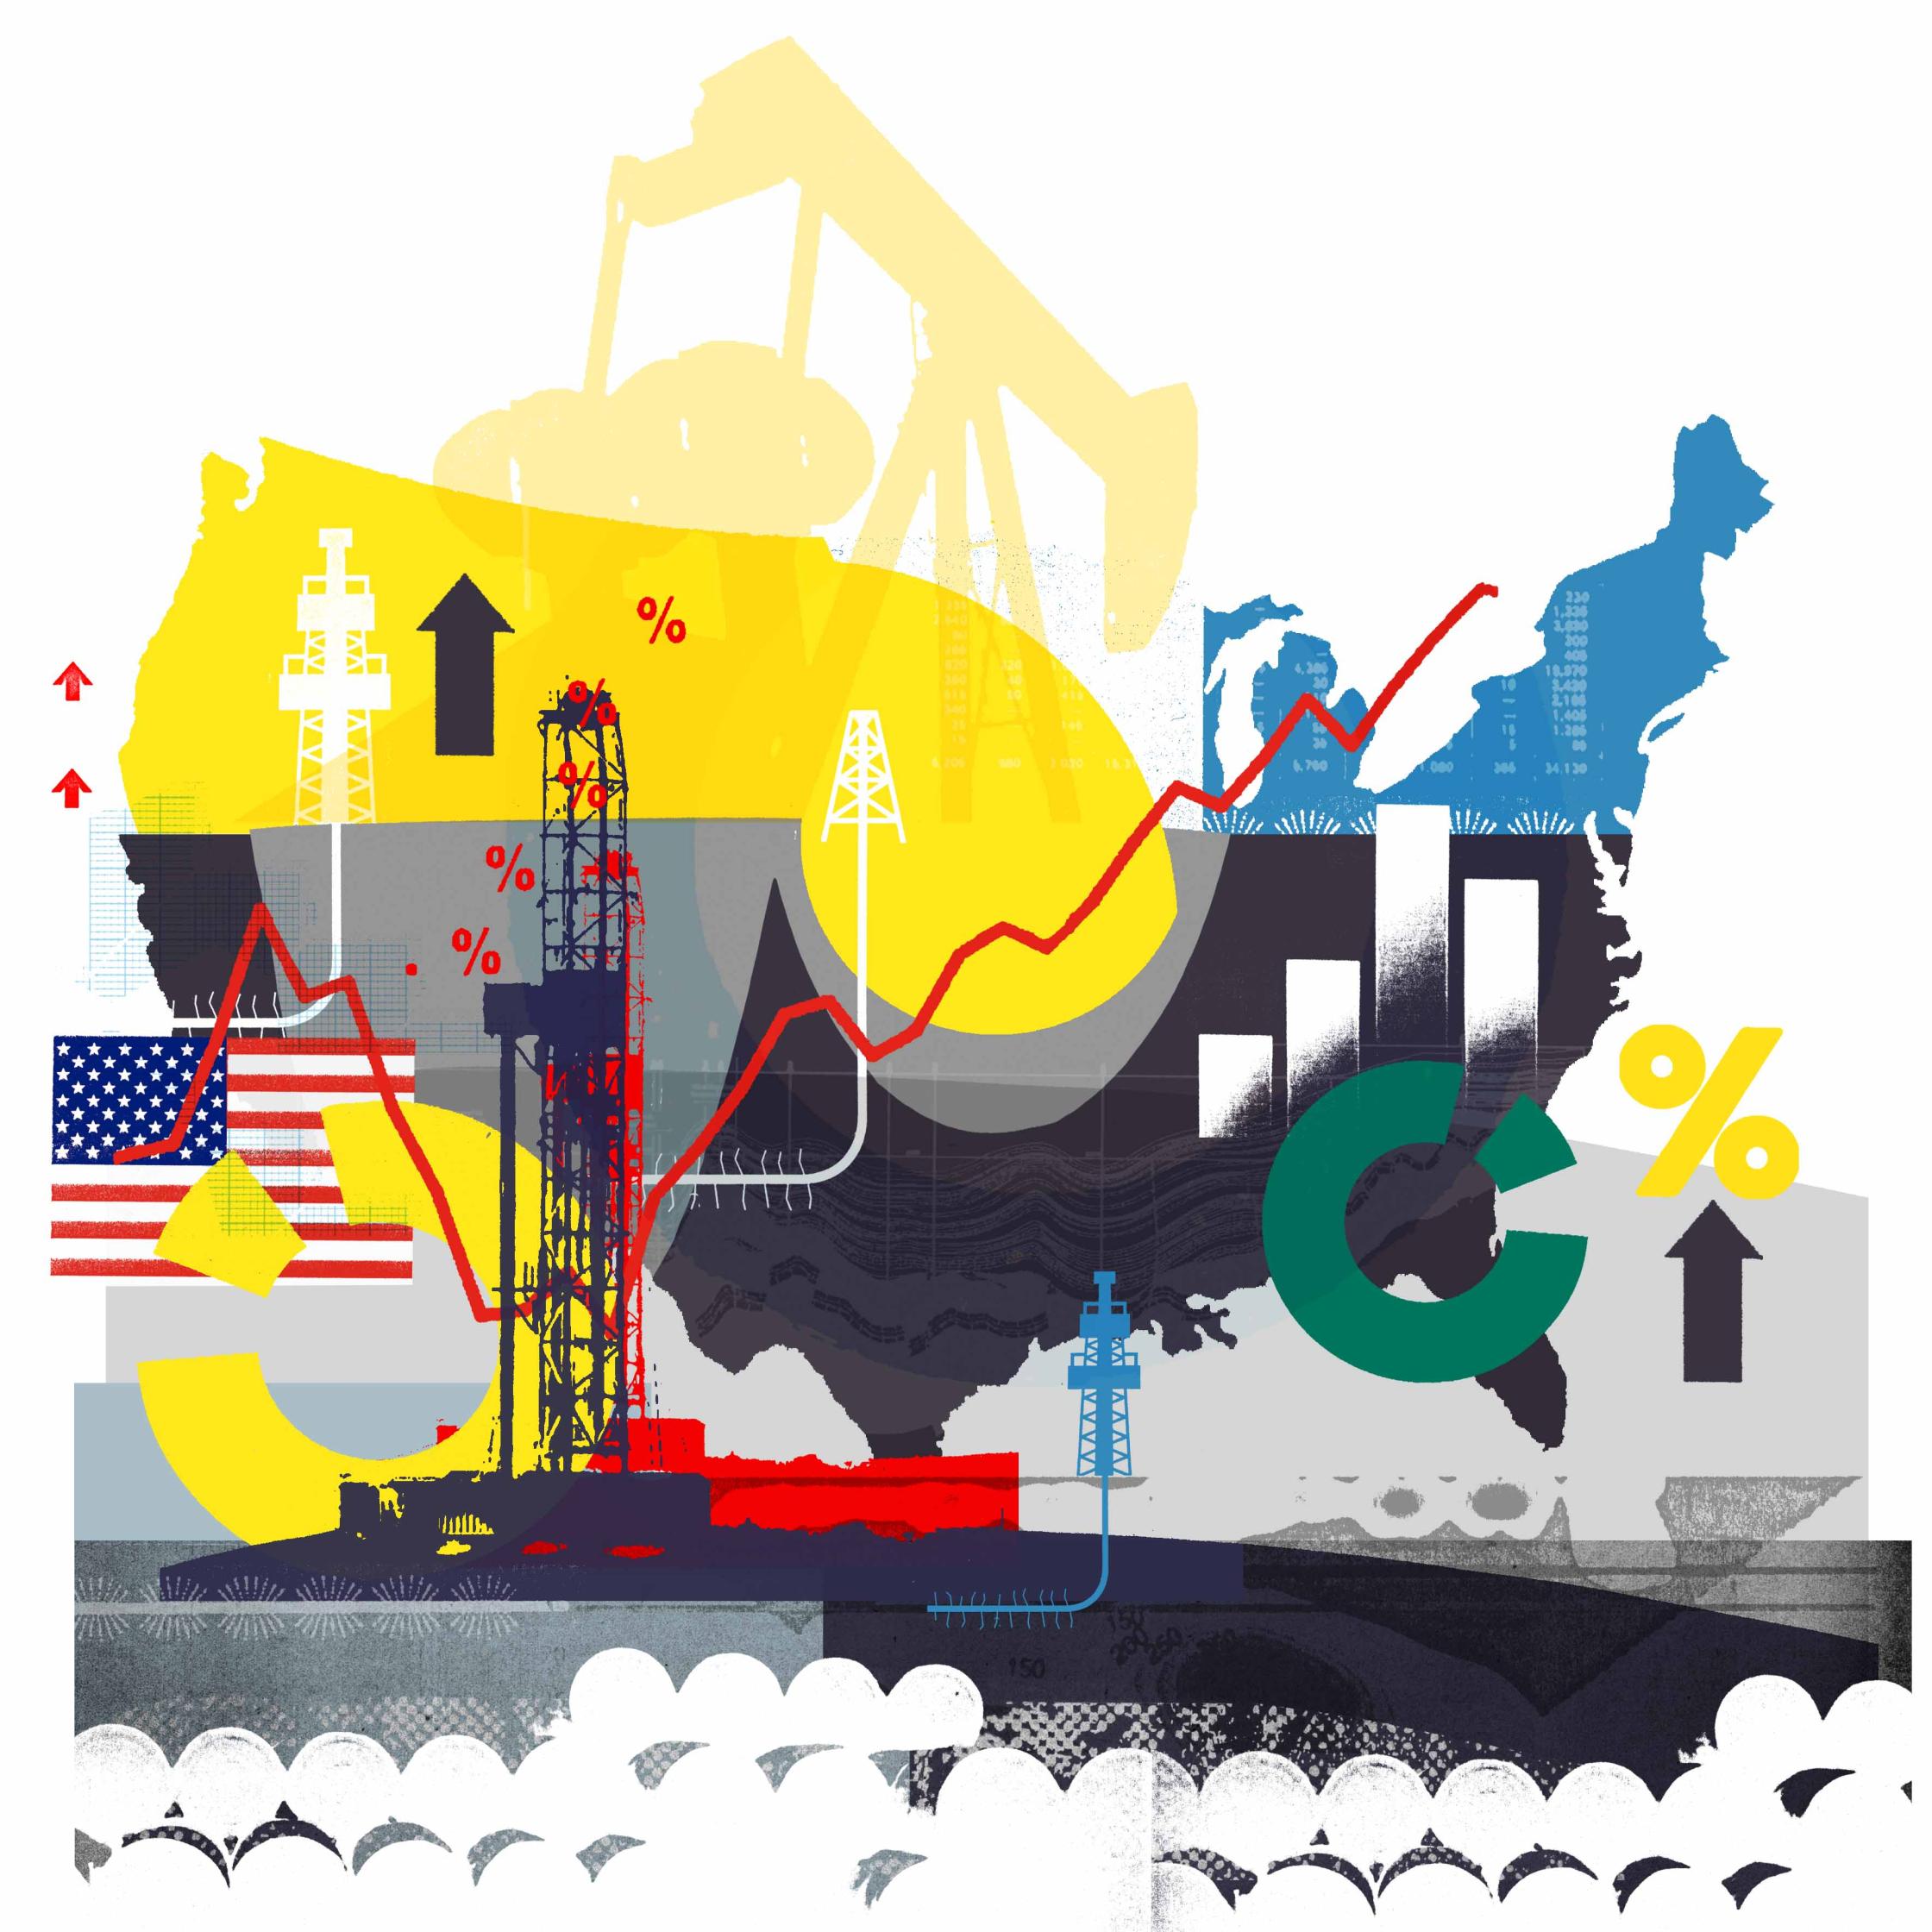 US Oil Companies